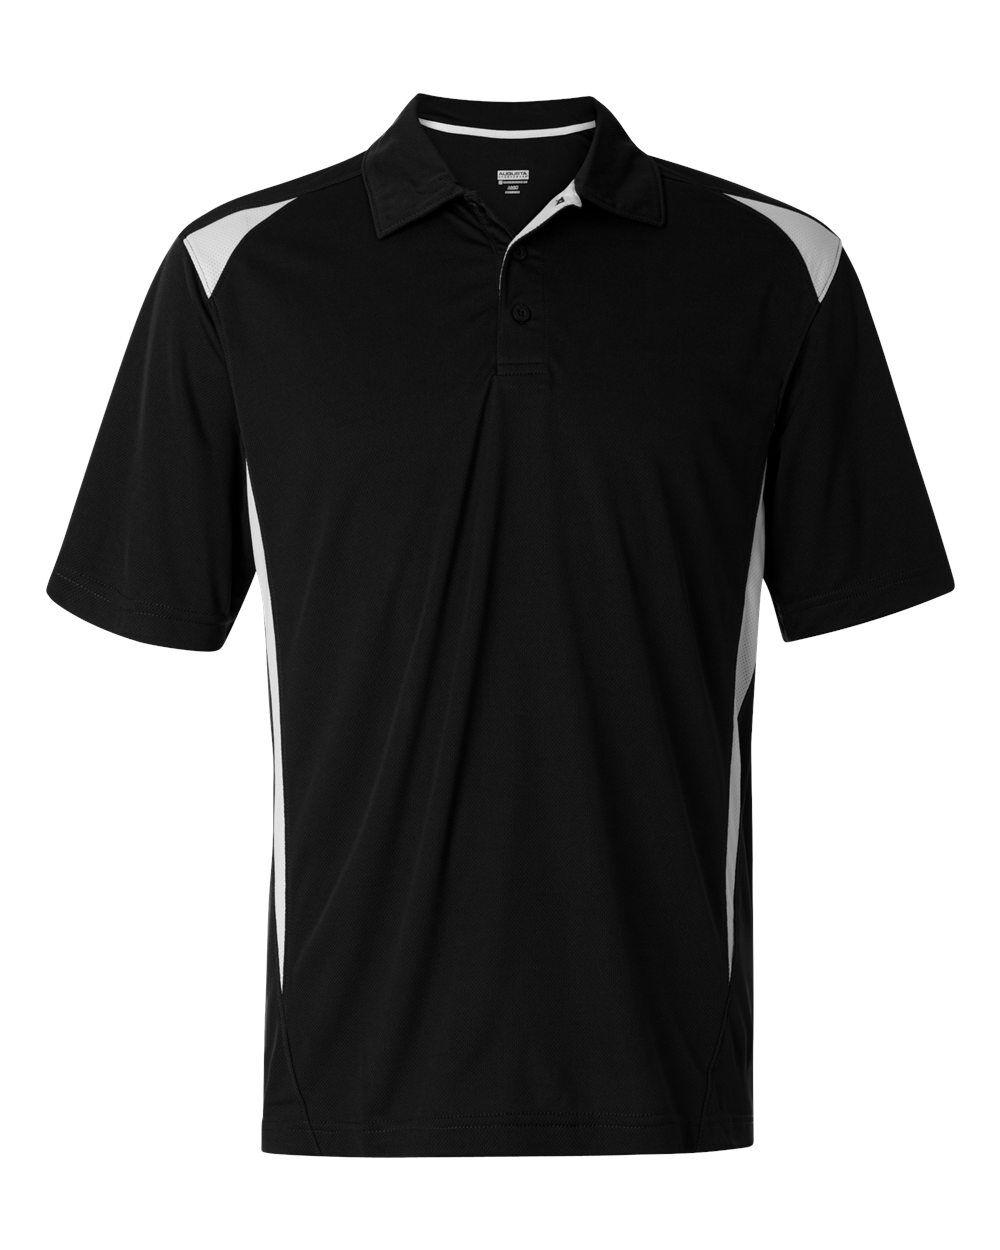 Augusta Sportswear - Two-Tone Premier Sport Shirt - 5012 - Black/ White - Large